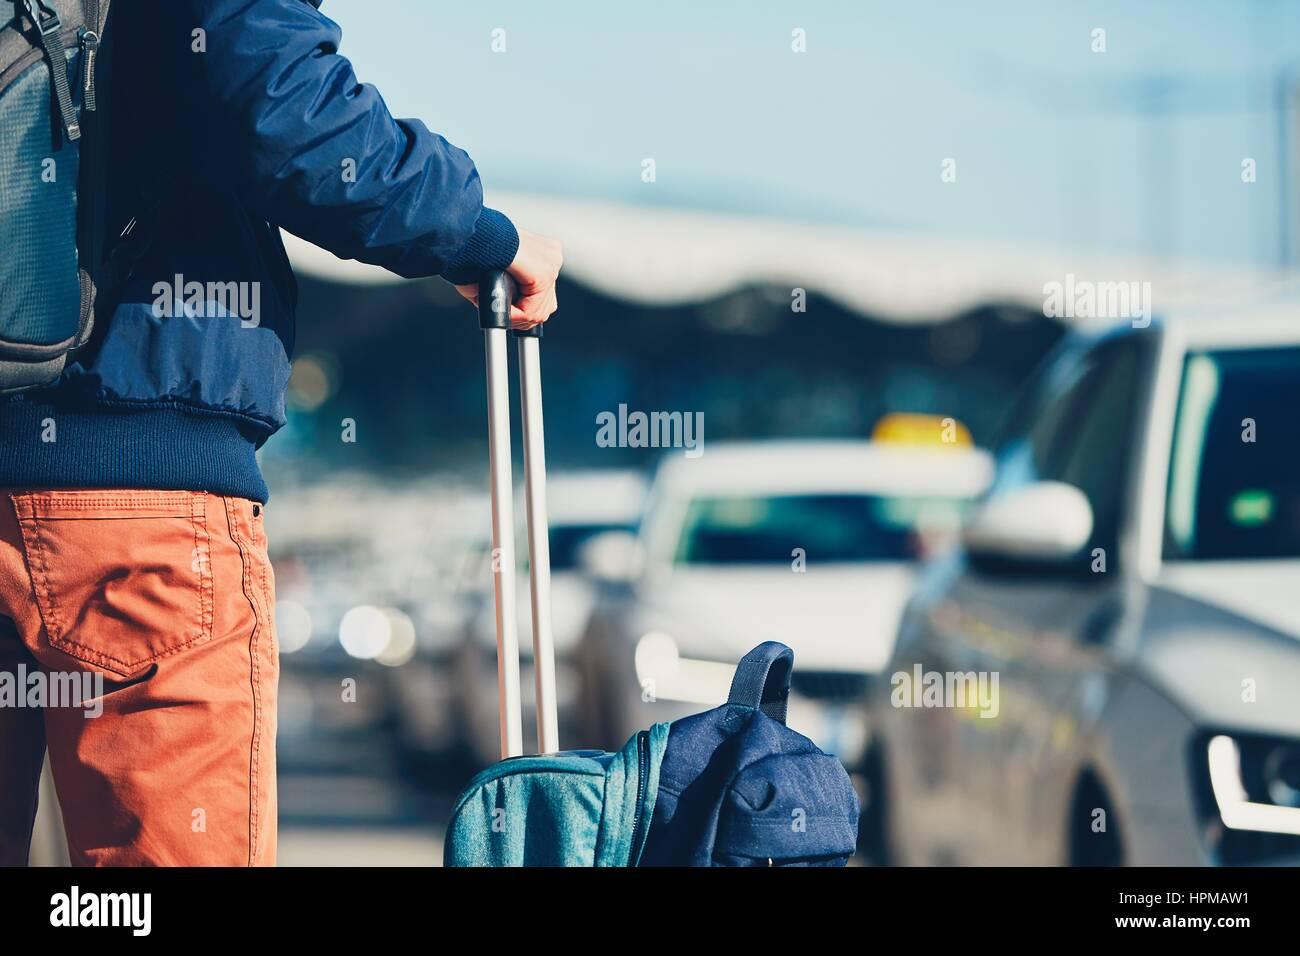 Flughafen-Taxi. Taxi Auto erwartet Pkw. Stockbild